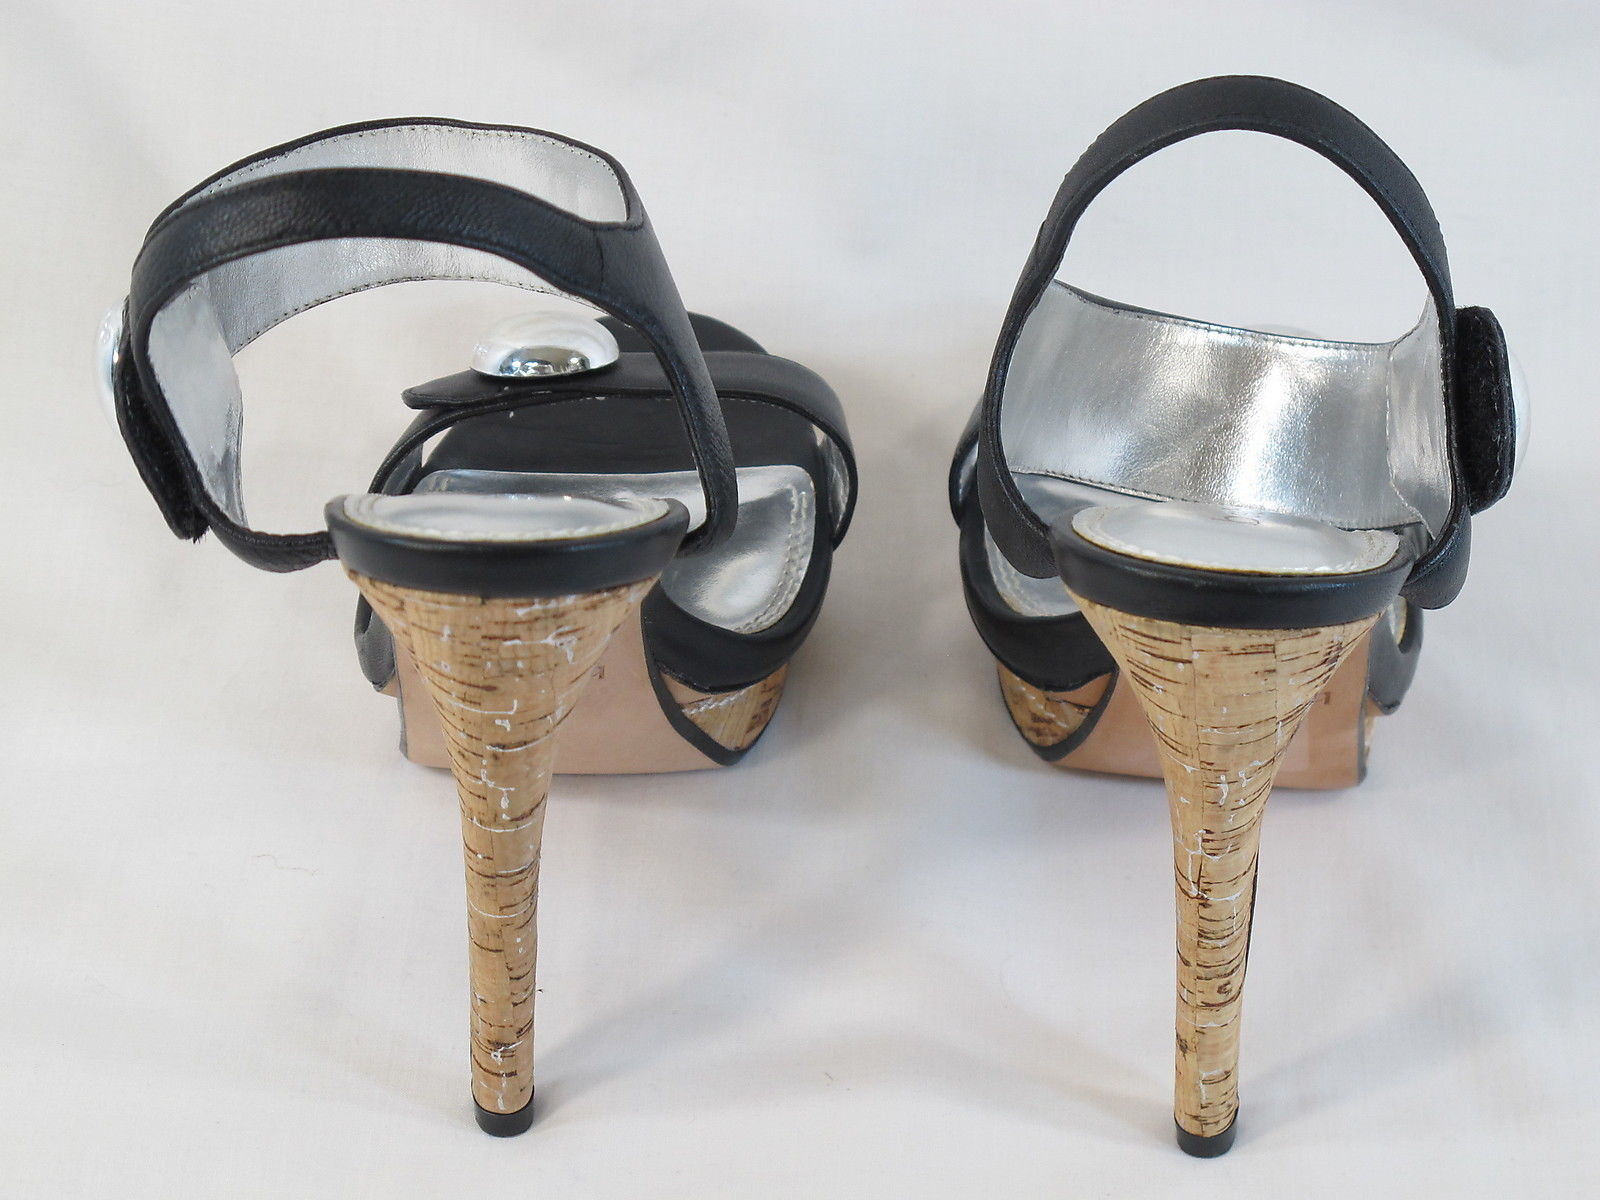 95065b924469 Bebe Black Leather Platform Open Toe Ankle Strap Heels Size 9 M US Near Mint